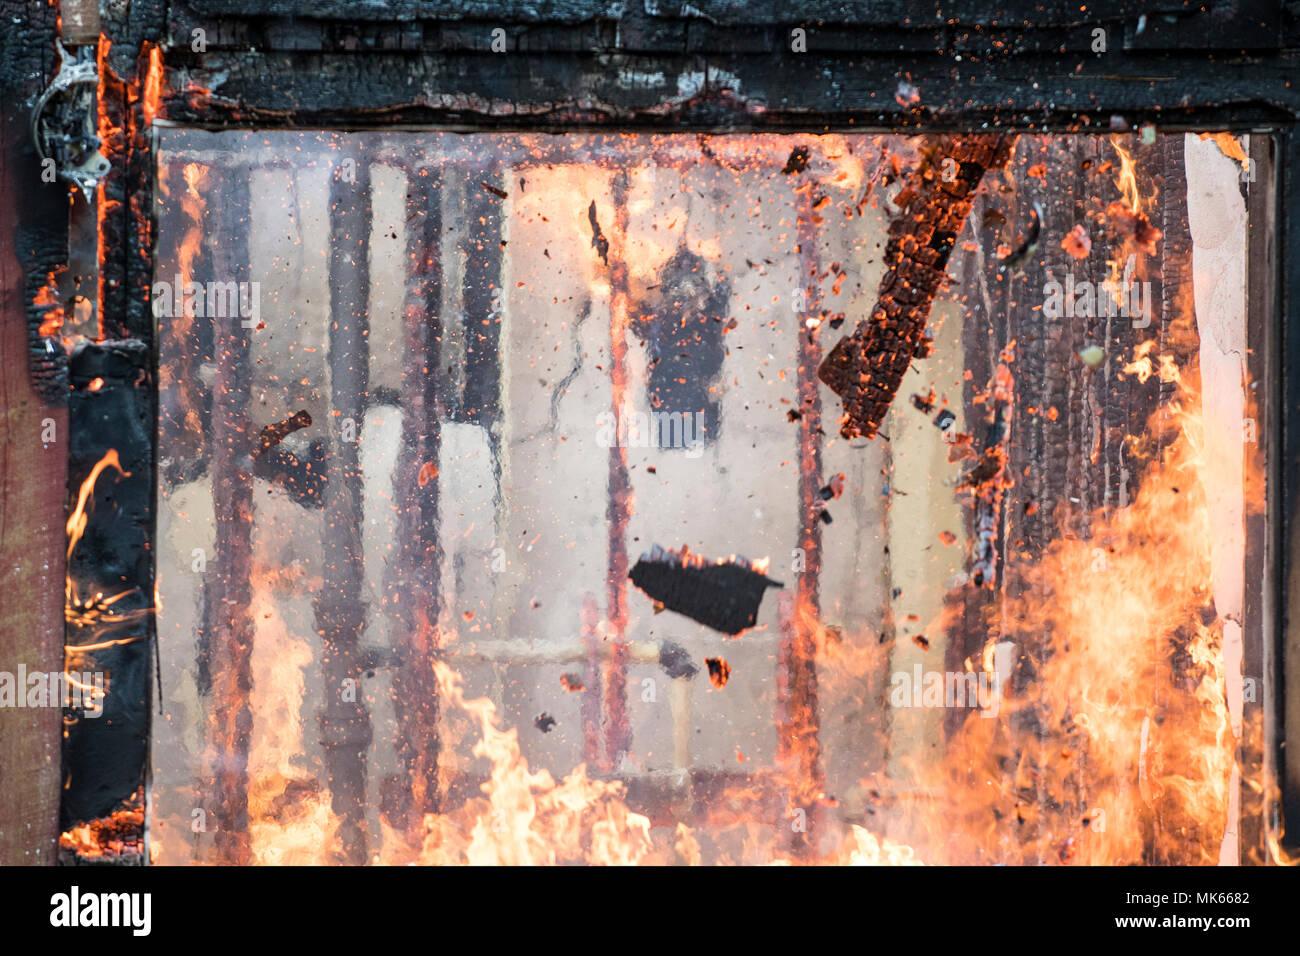 Live Fire Training North Mason Fire Deparement, Washington State, USA Stock Photo